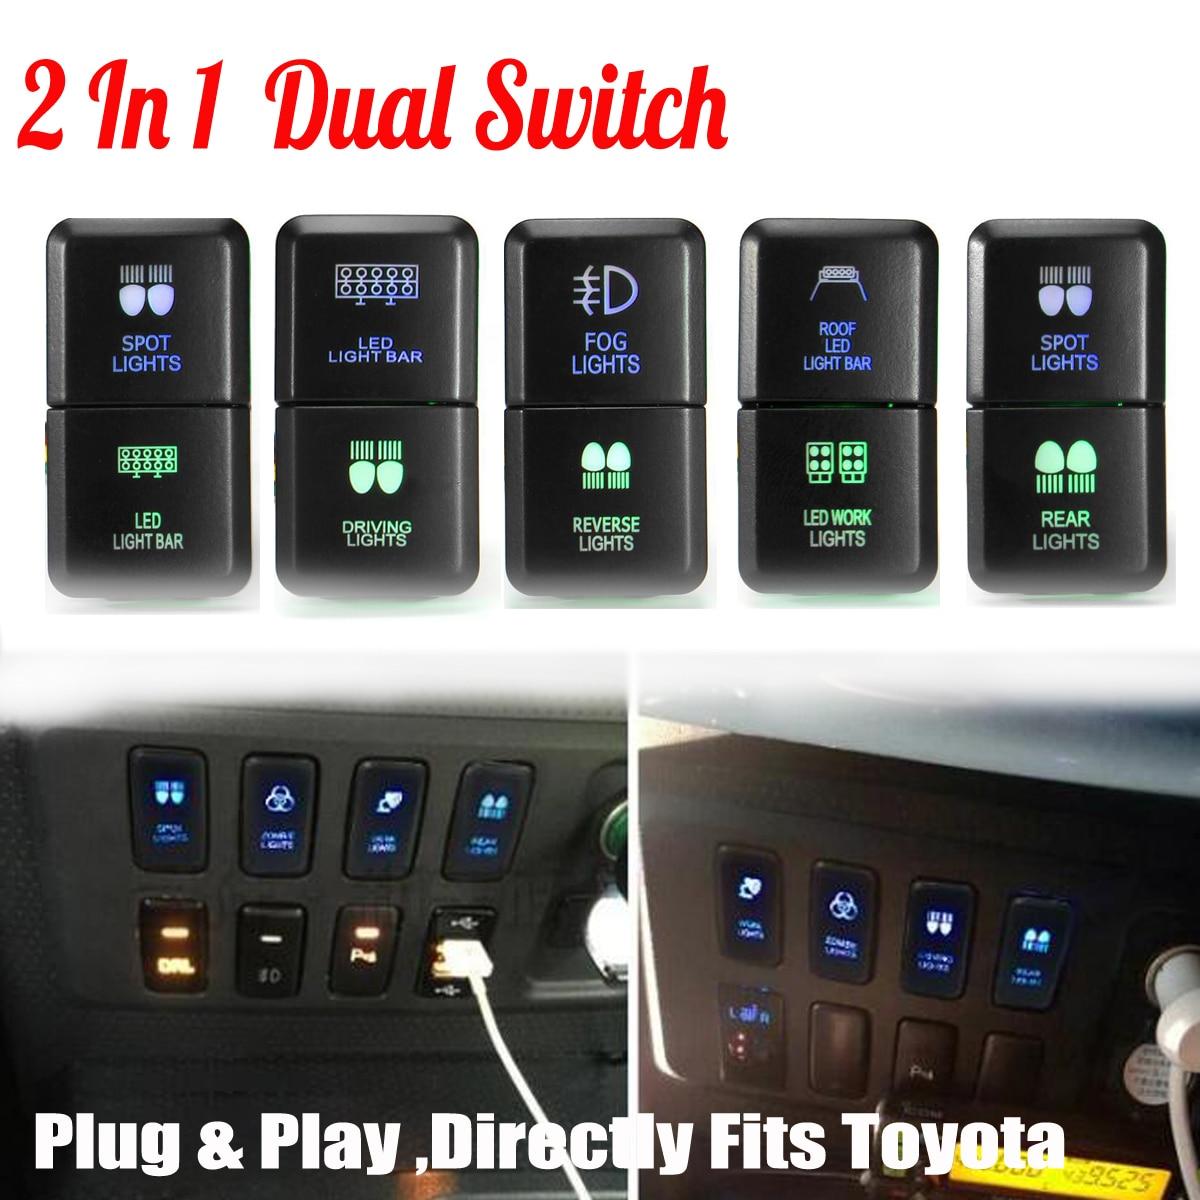 12V Car Auto Dual LED Light Bar On-Off Push Switch Work Fog Light Spot Light Button Switch For Toyota Prado Hilux Landcruiser car fog light switch with red led indicator 12v